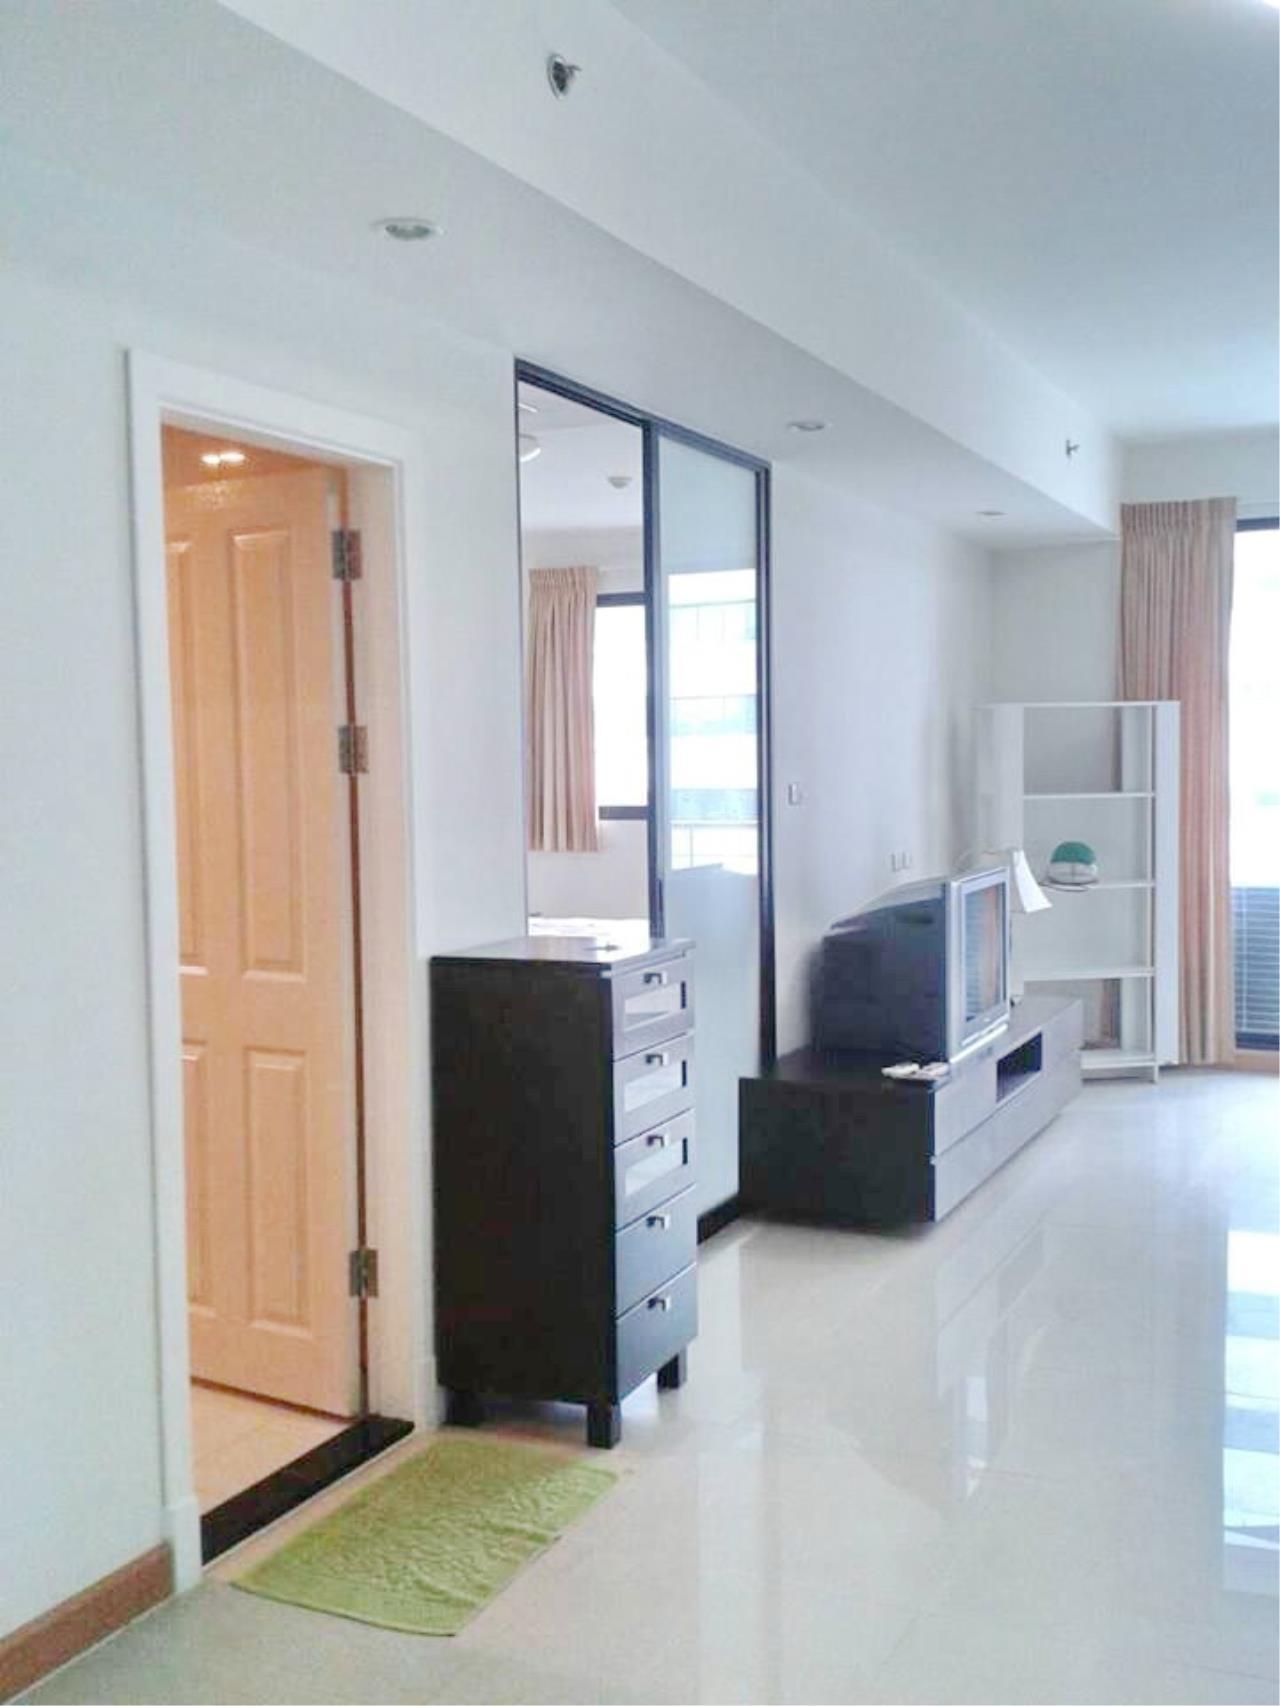 Agent - Mayteekul Sujirapinyokul Agency's AC5180418 For Rent Condo Supalai Premier Place Asoke Condo MRT Phetchaburi 2